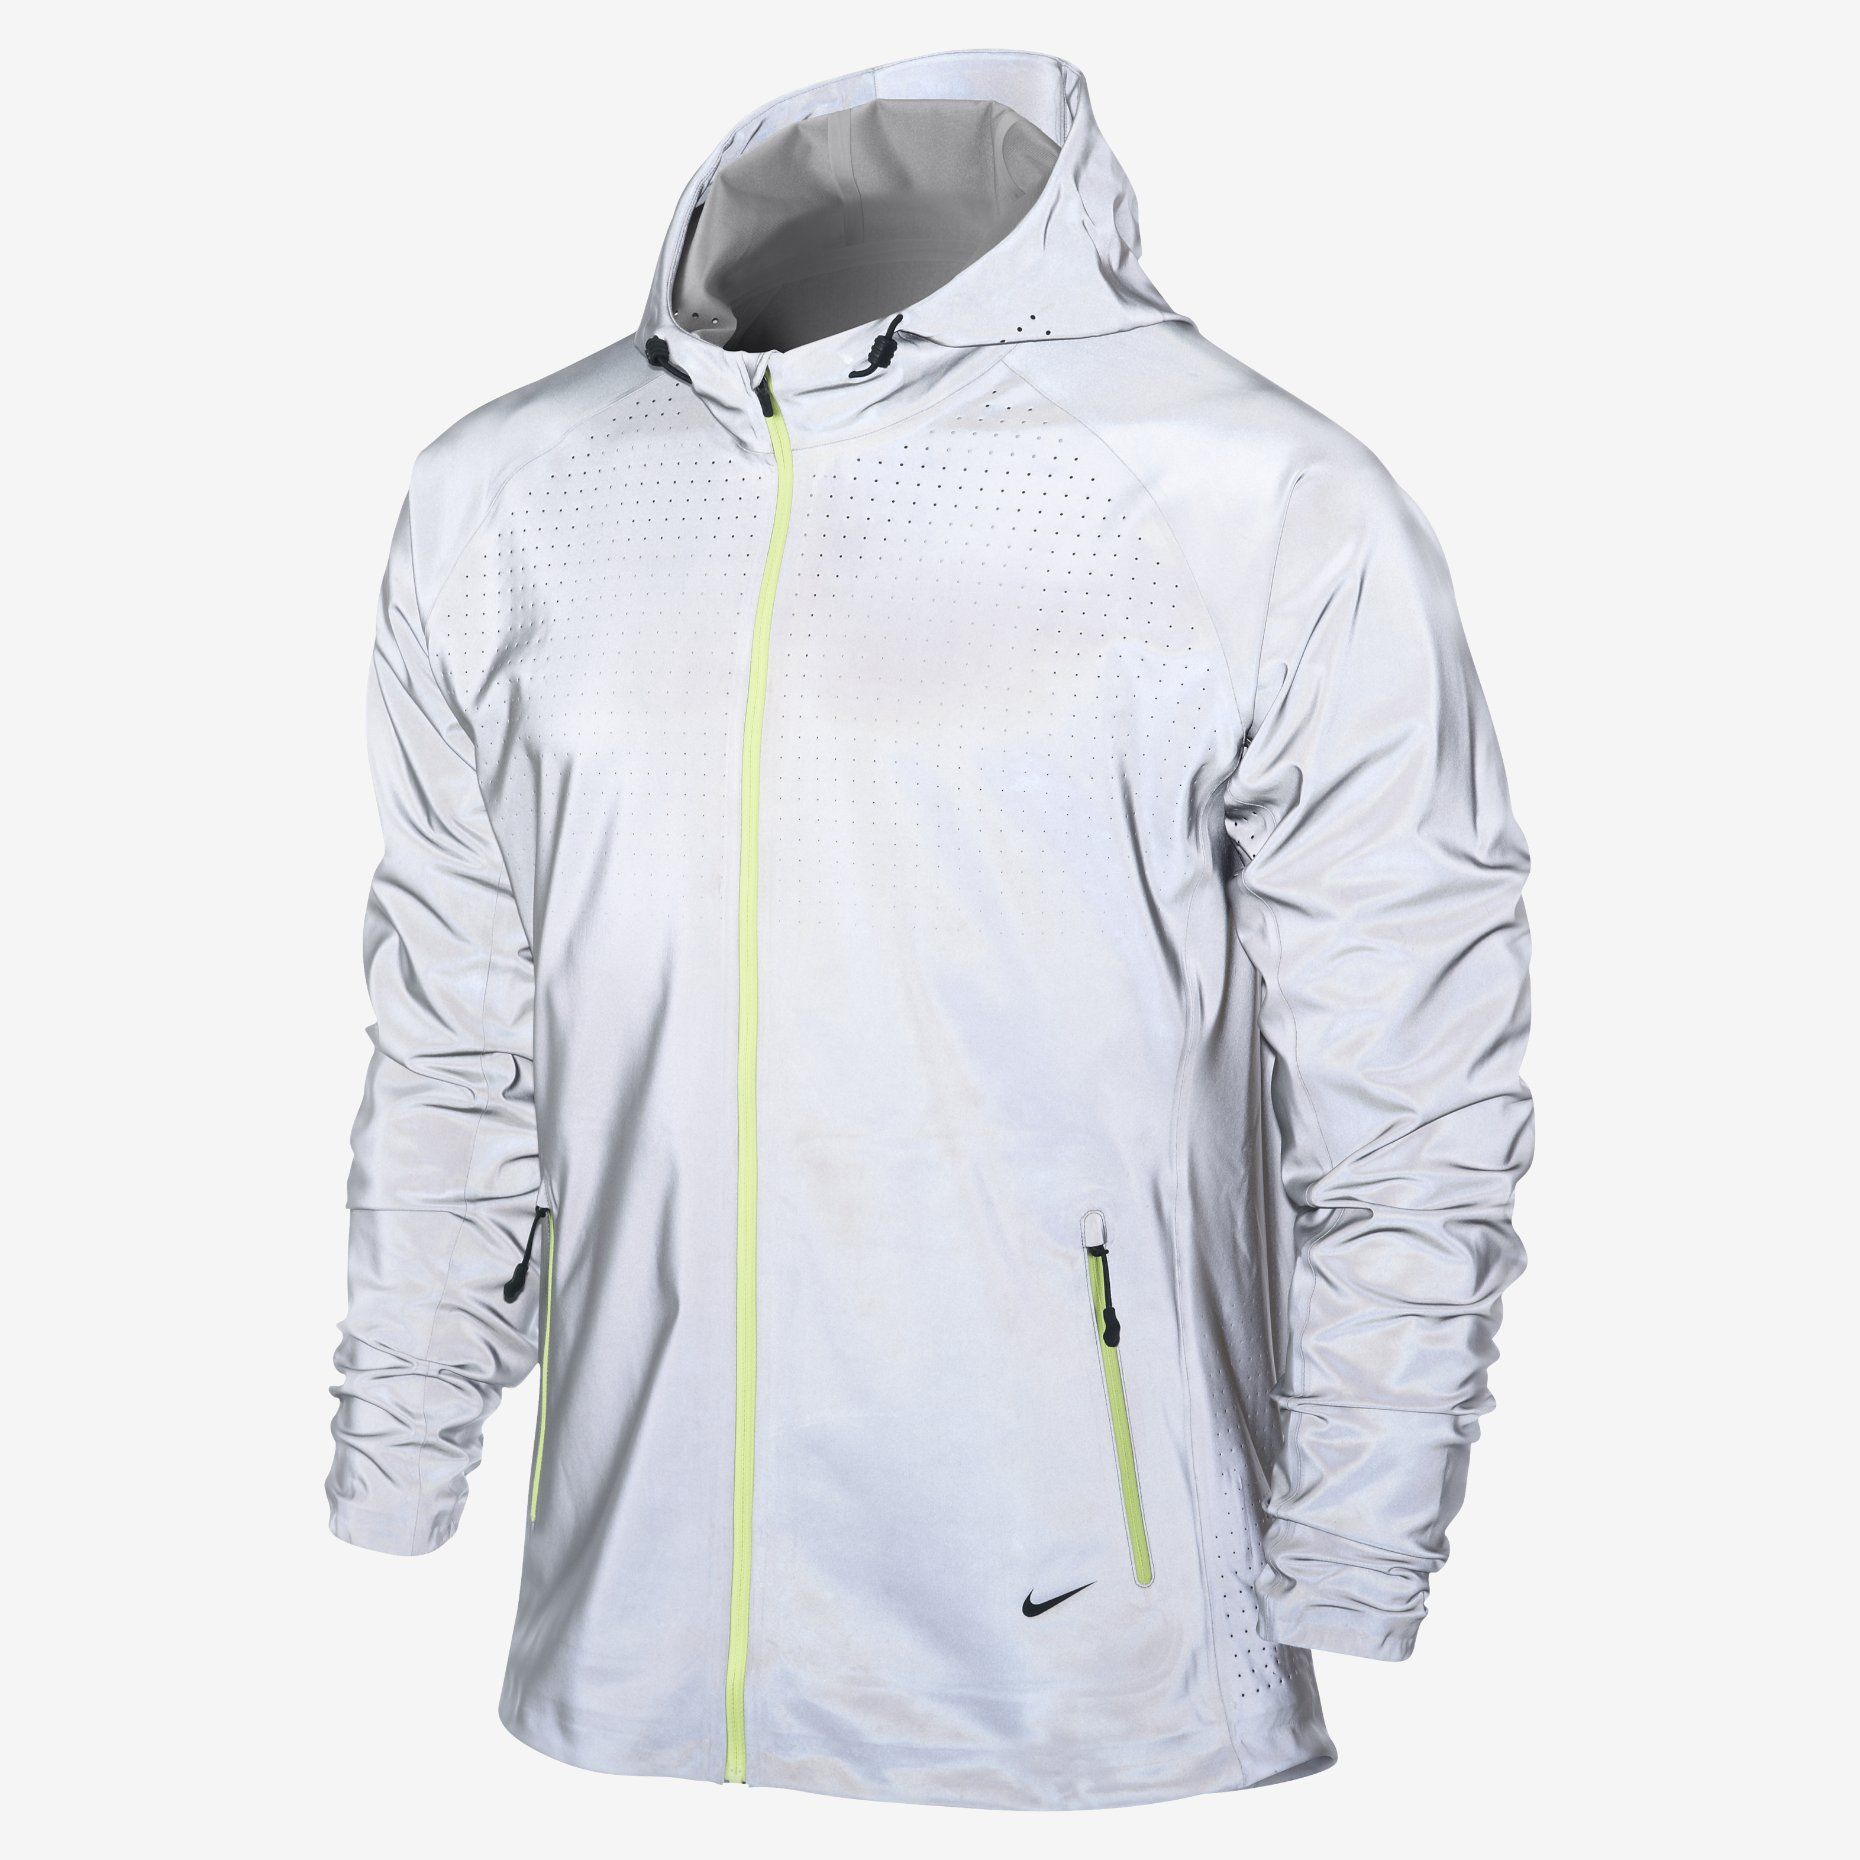 nike womens vapor running jacket white/silver granite